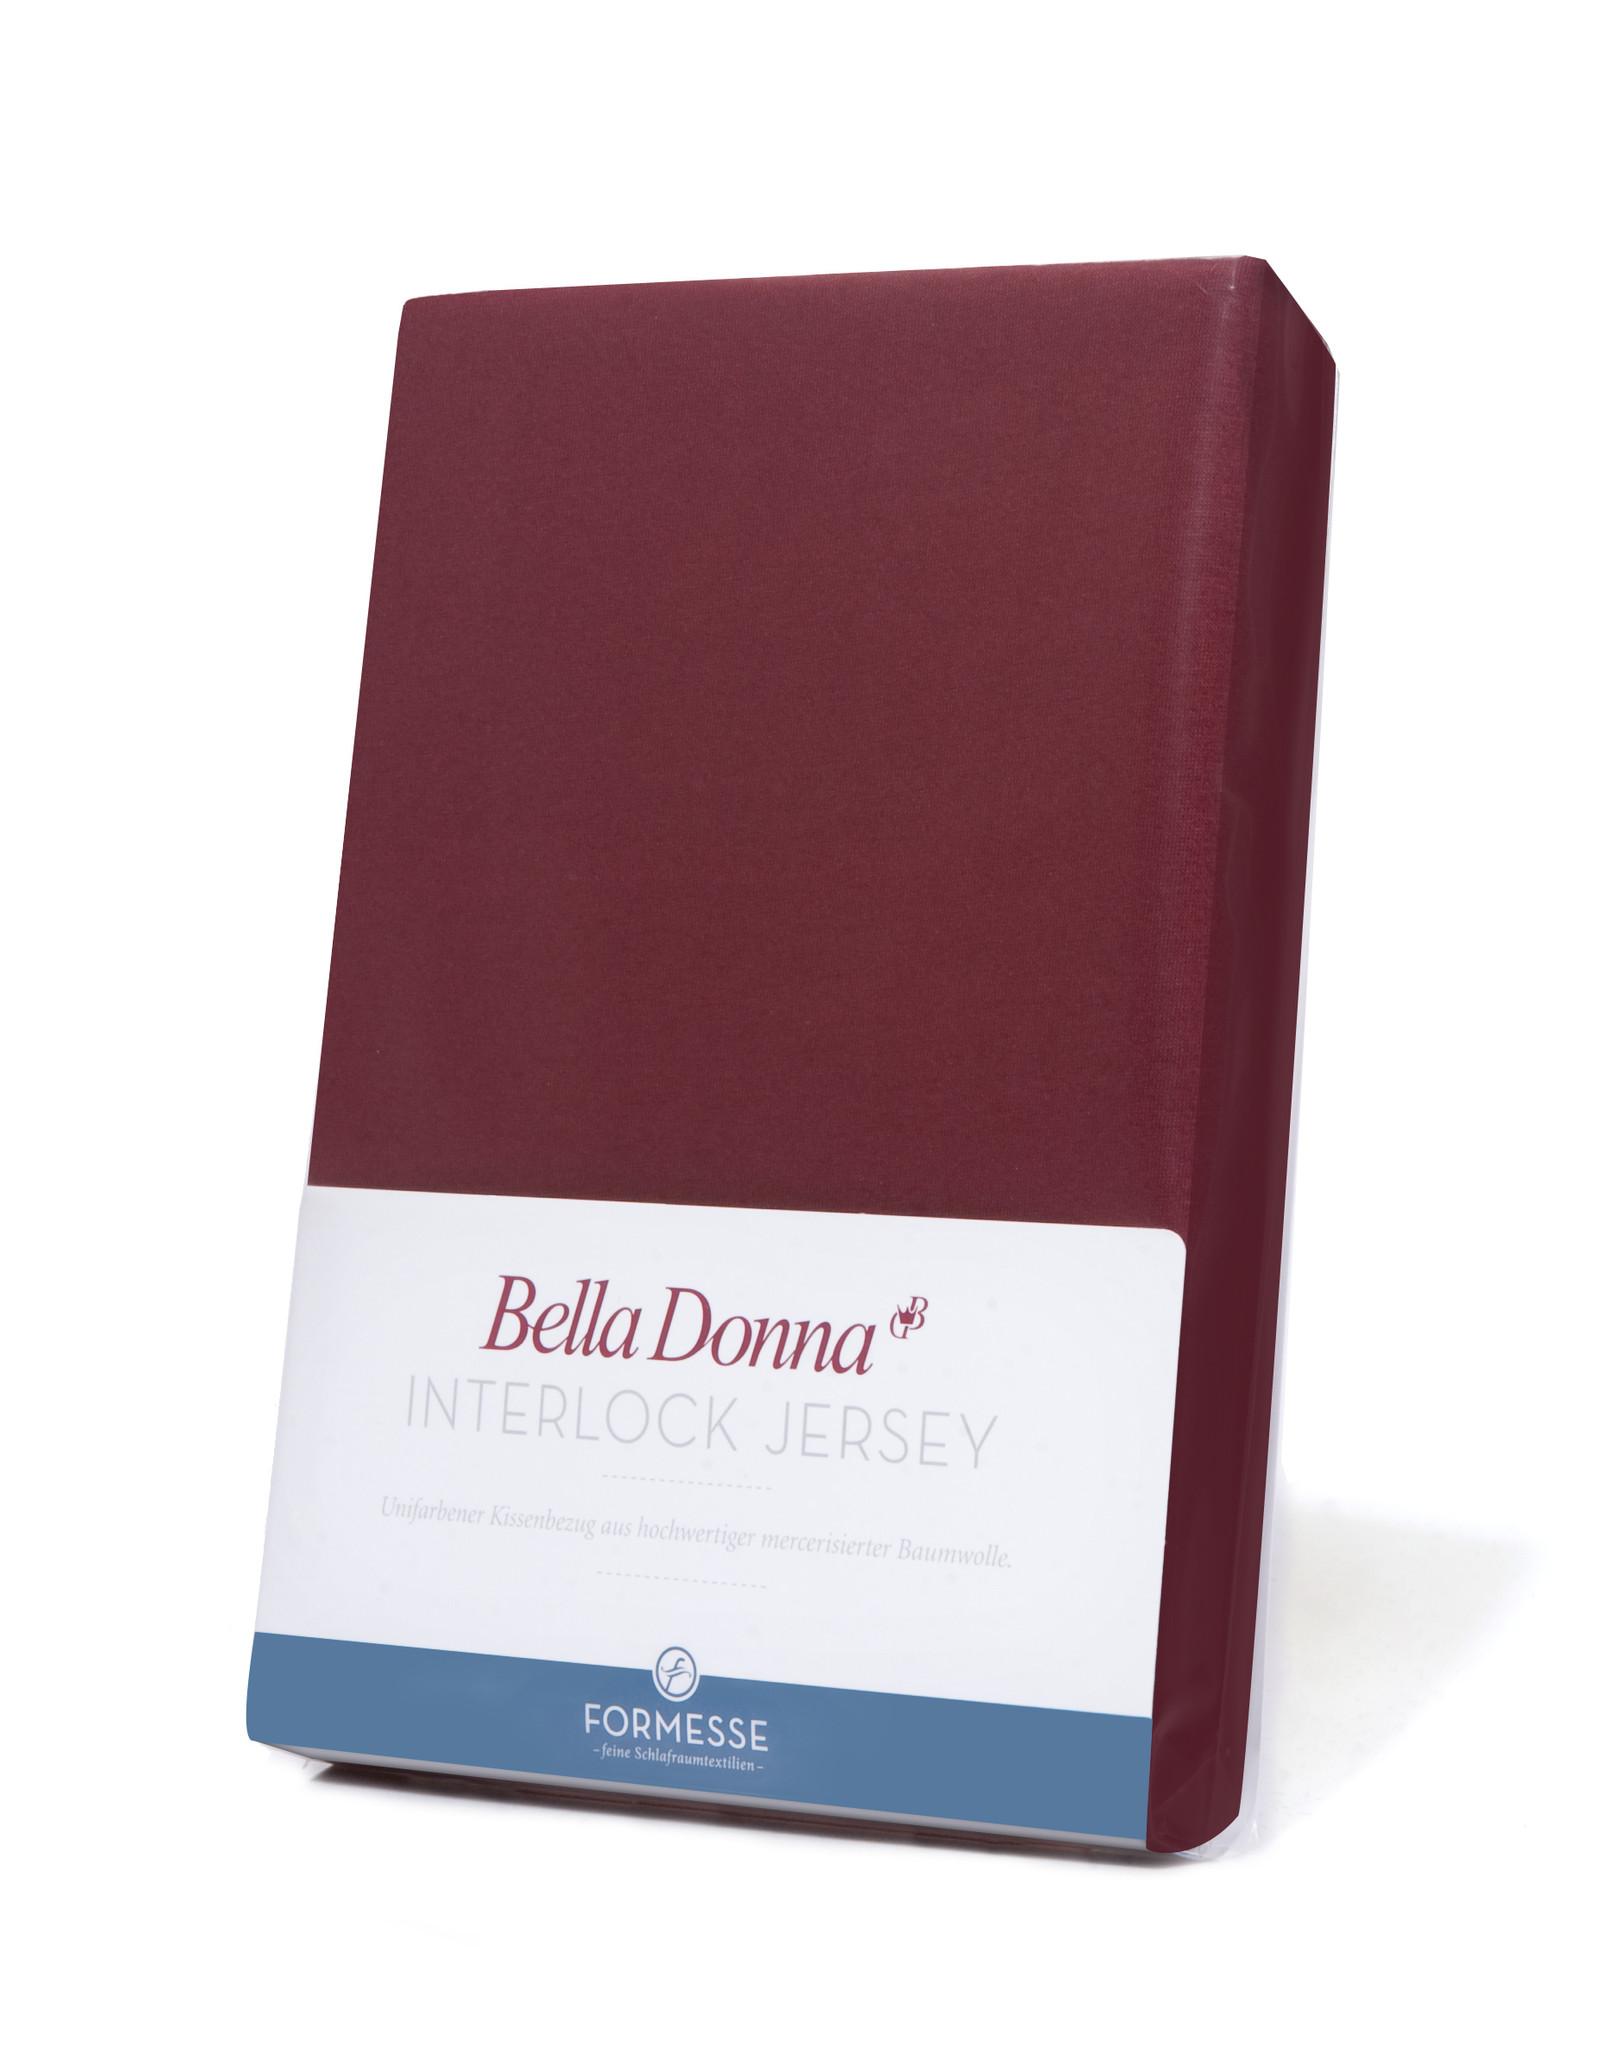 Formesse Kussensloop nekrol Bella Donna Interlock 15/40